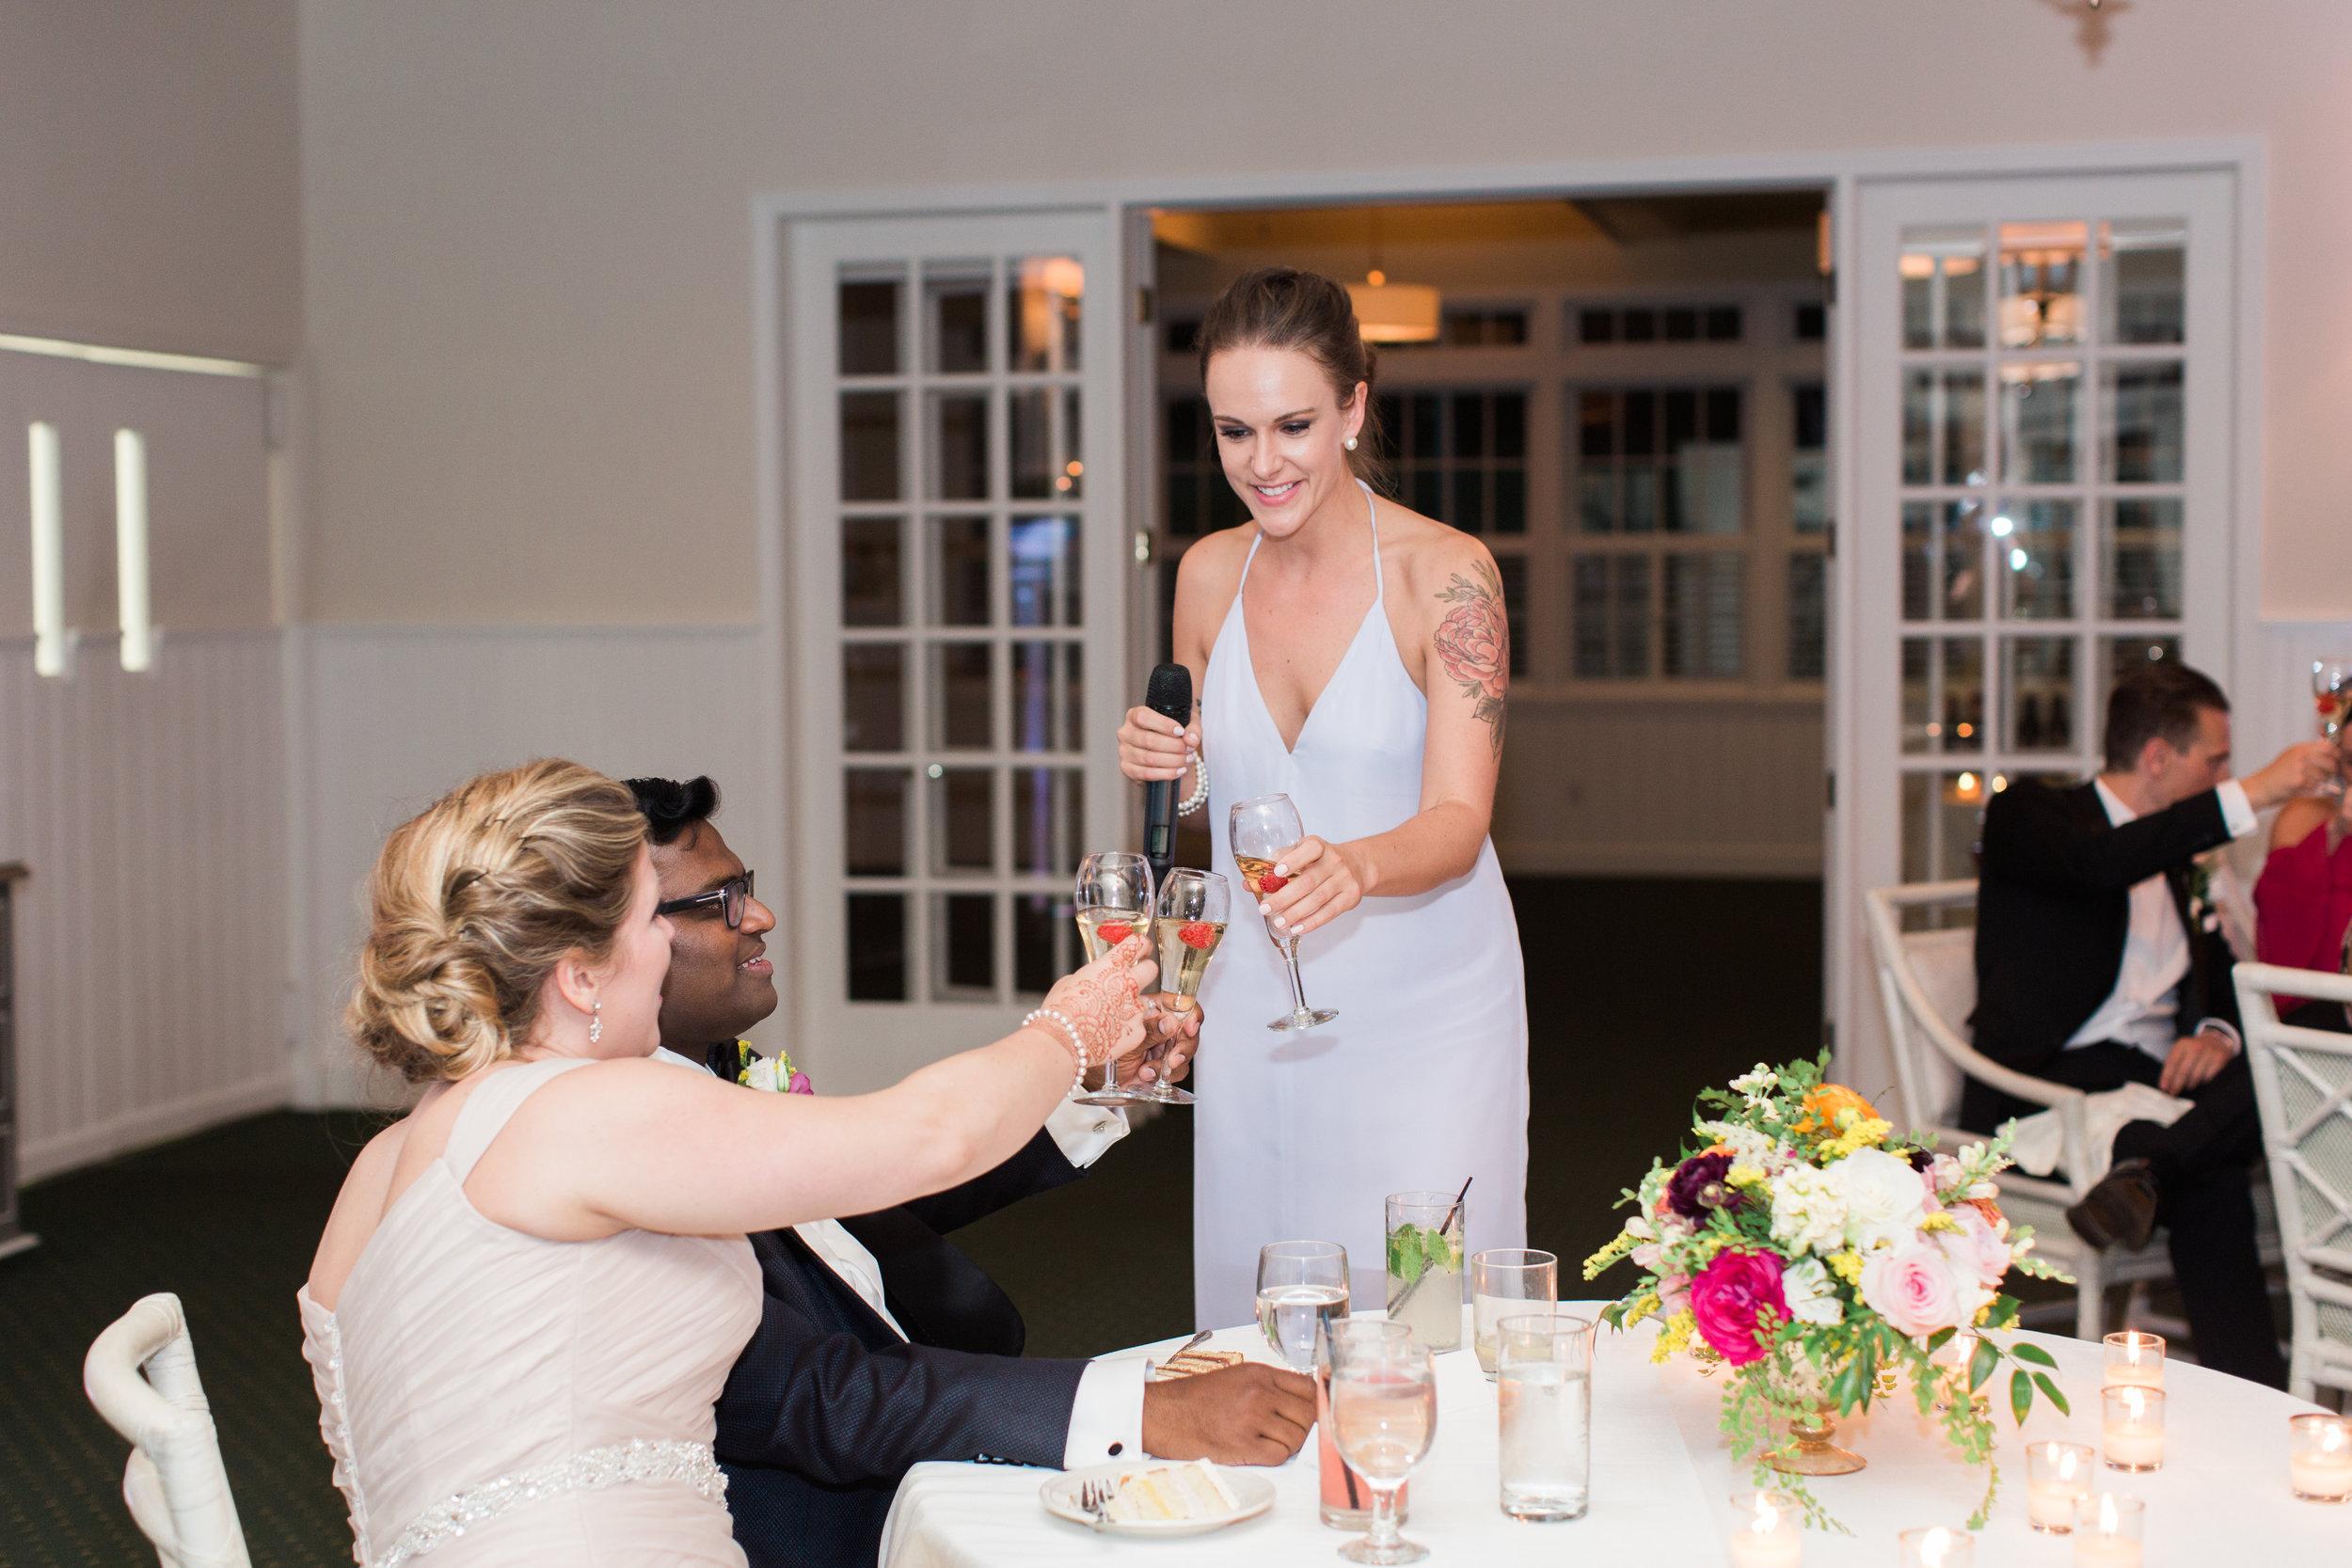 Govathoti+Wedding+Reception+Toasts-34.jpg